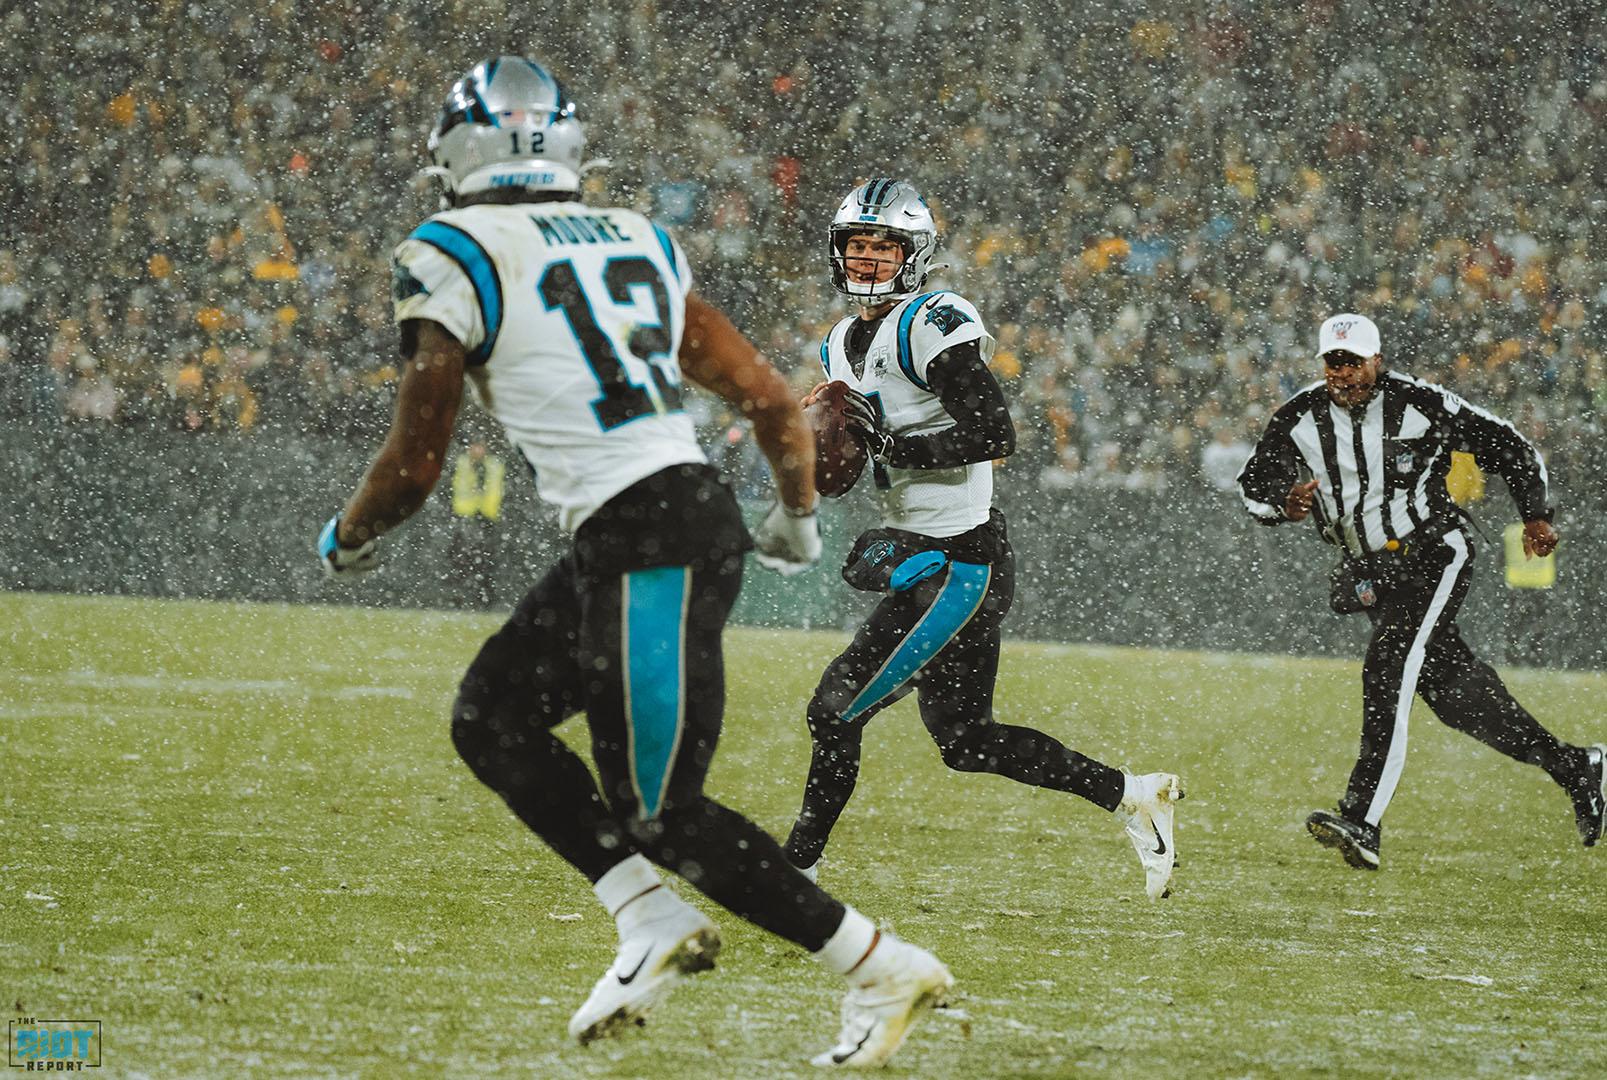 Photo Gallery: Panthers vs Packers | Week 10